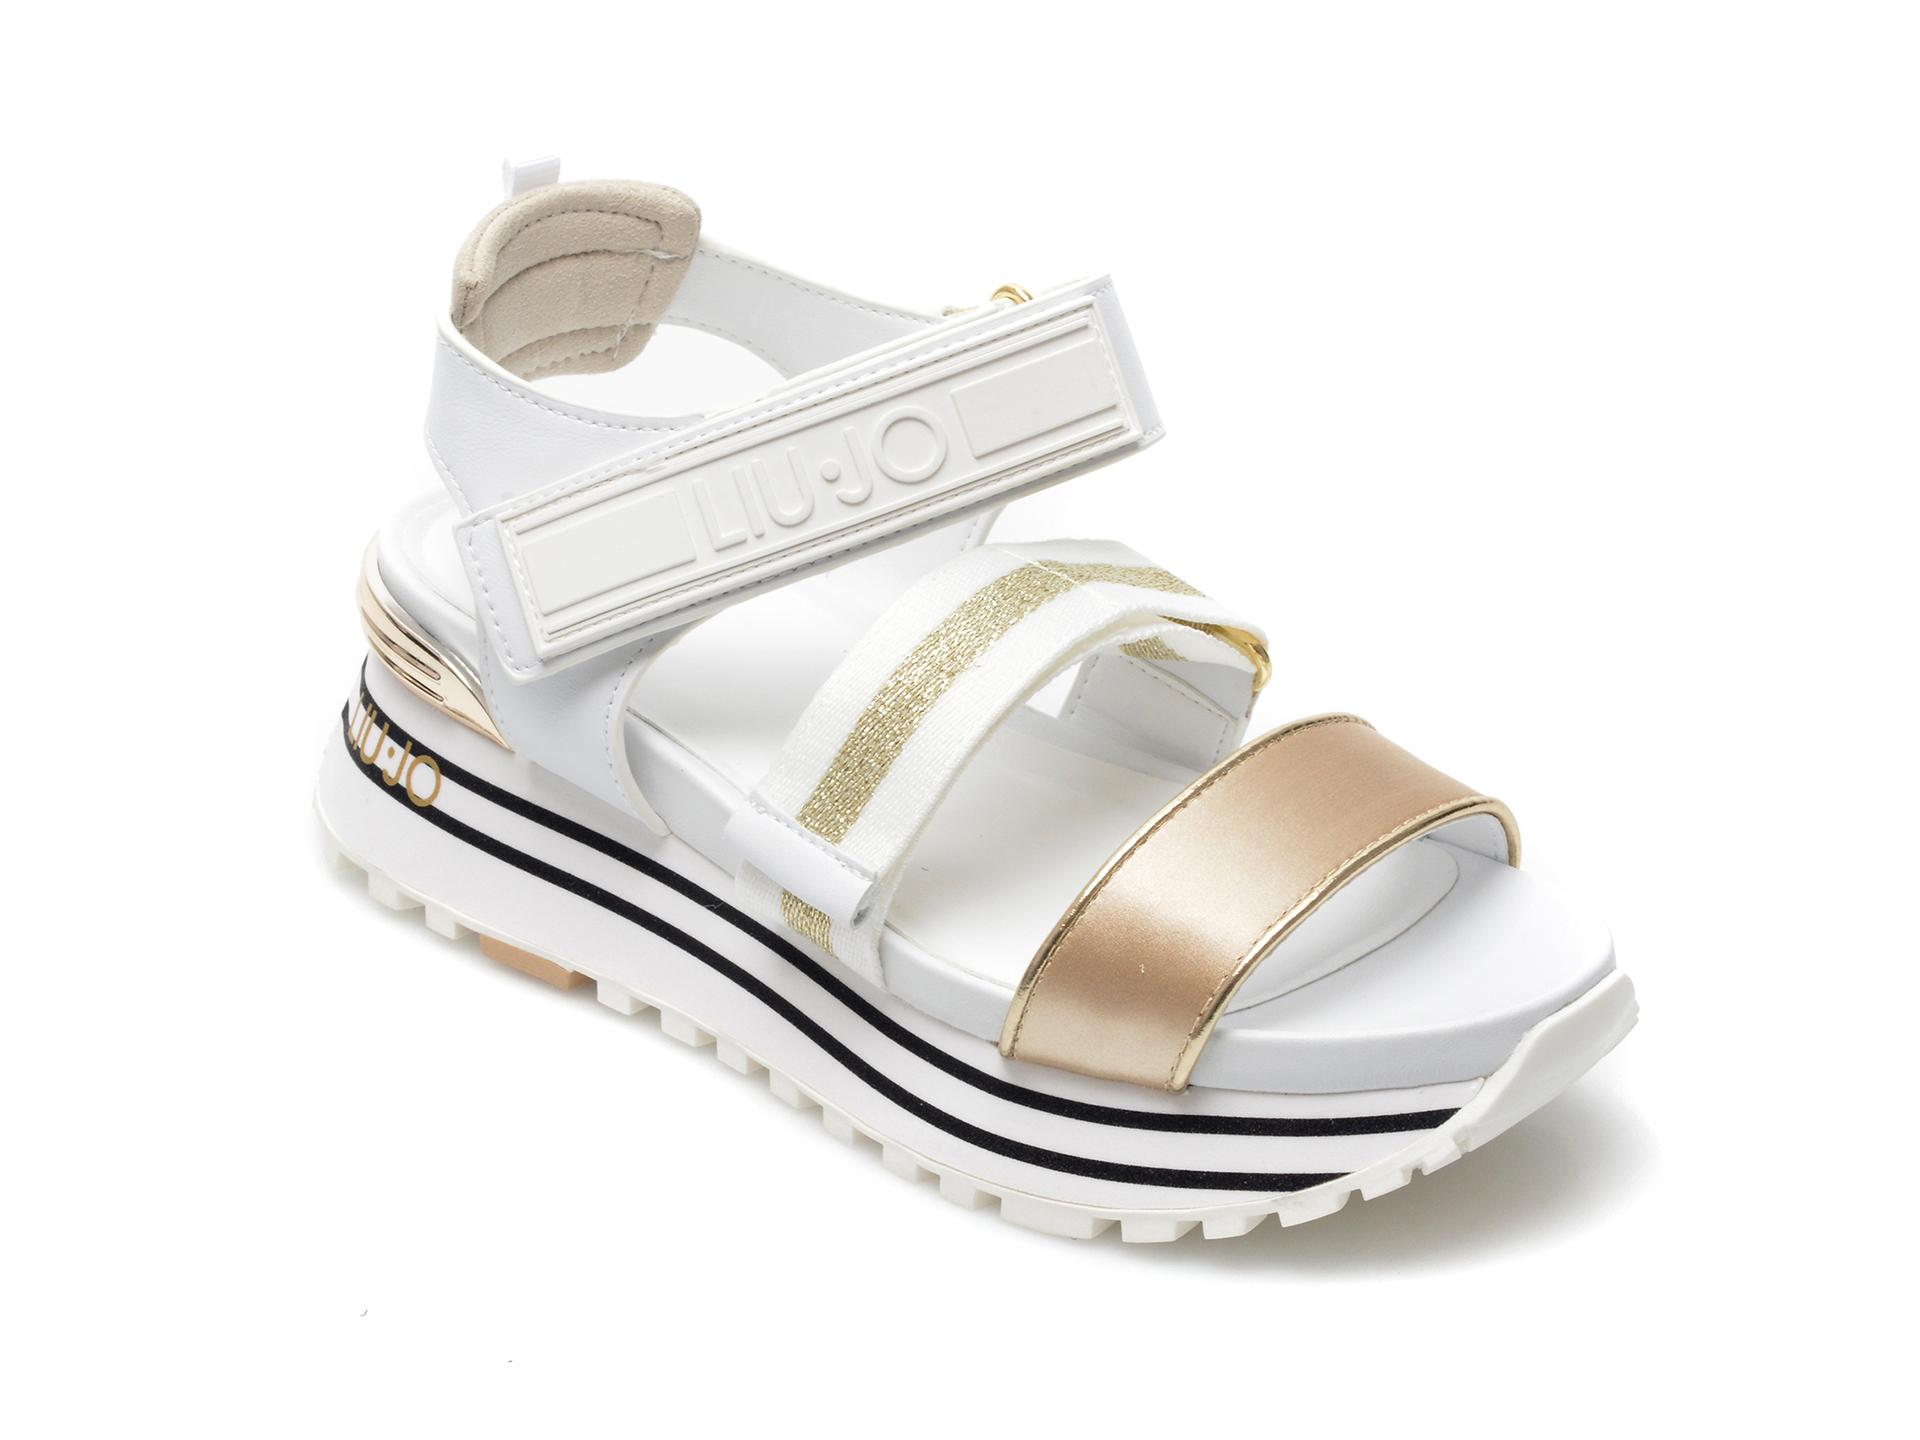 Sandale LIU JO albe, Maxi Wonder Sandal 7, din material textil si piele ecologica